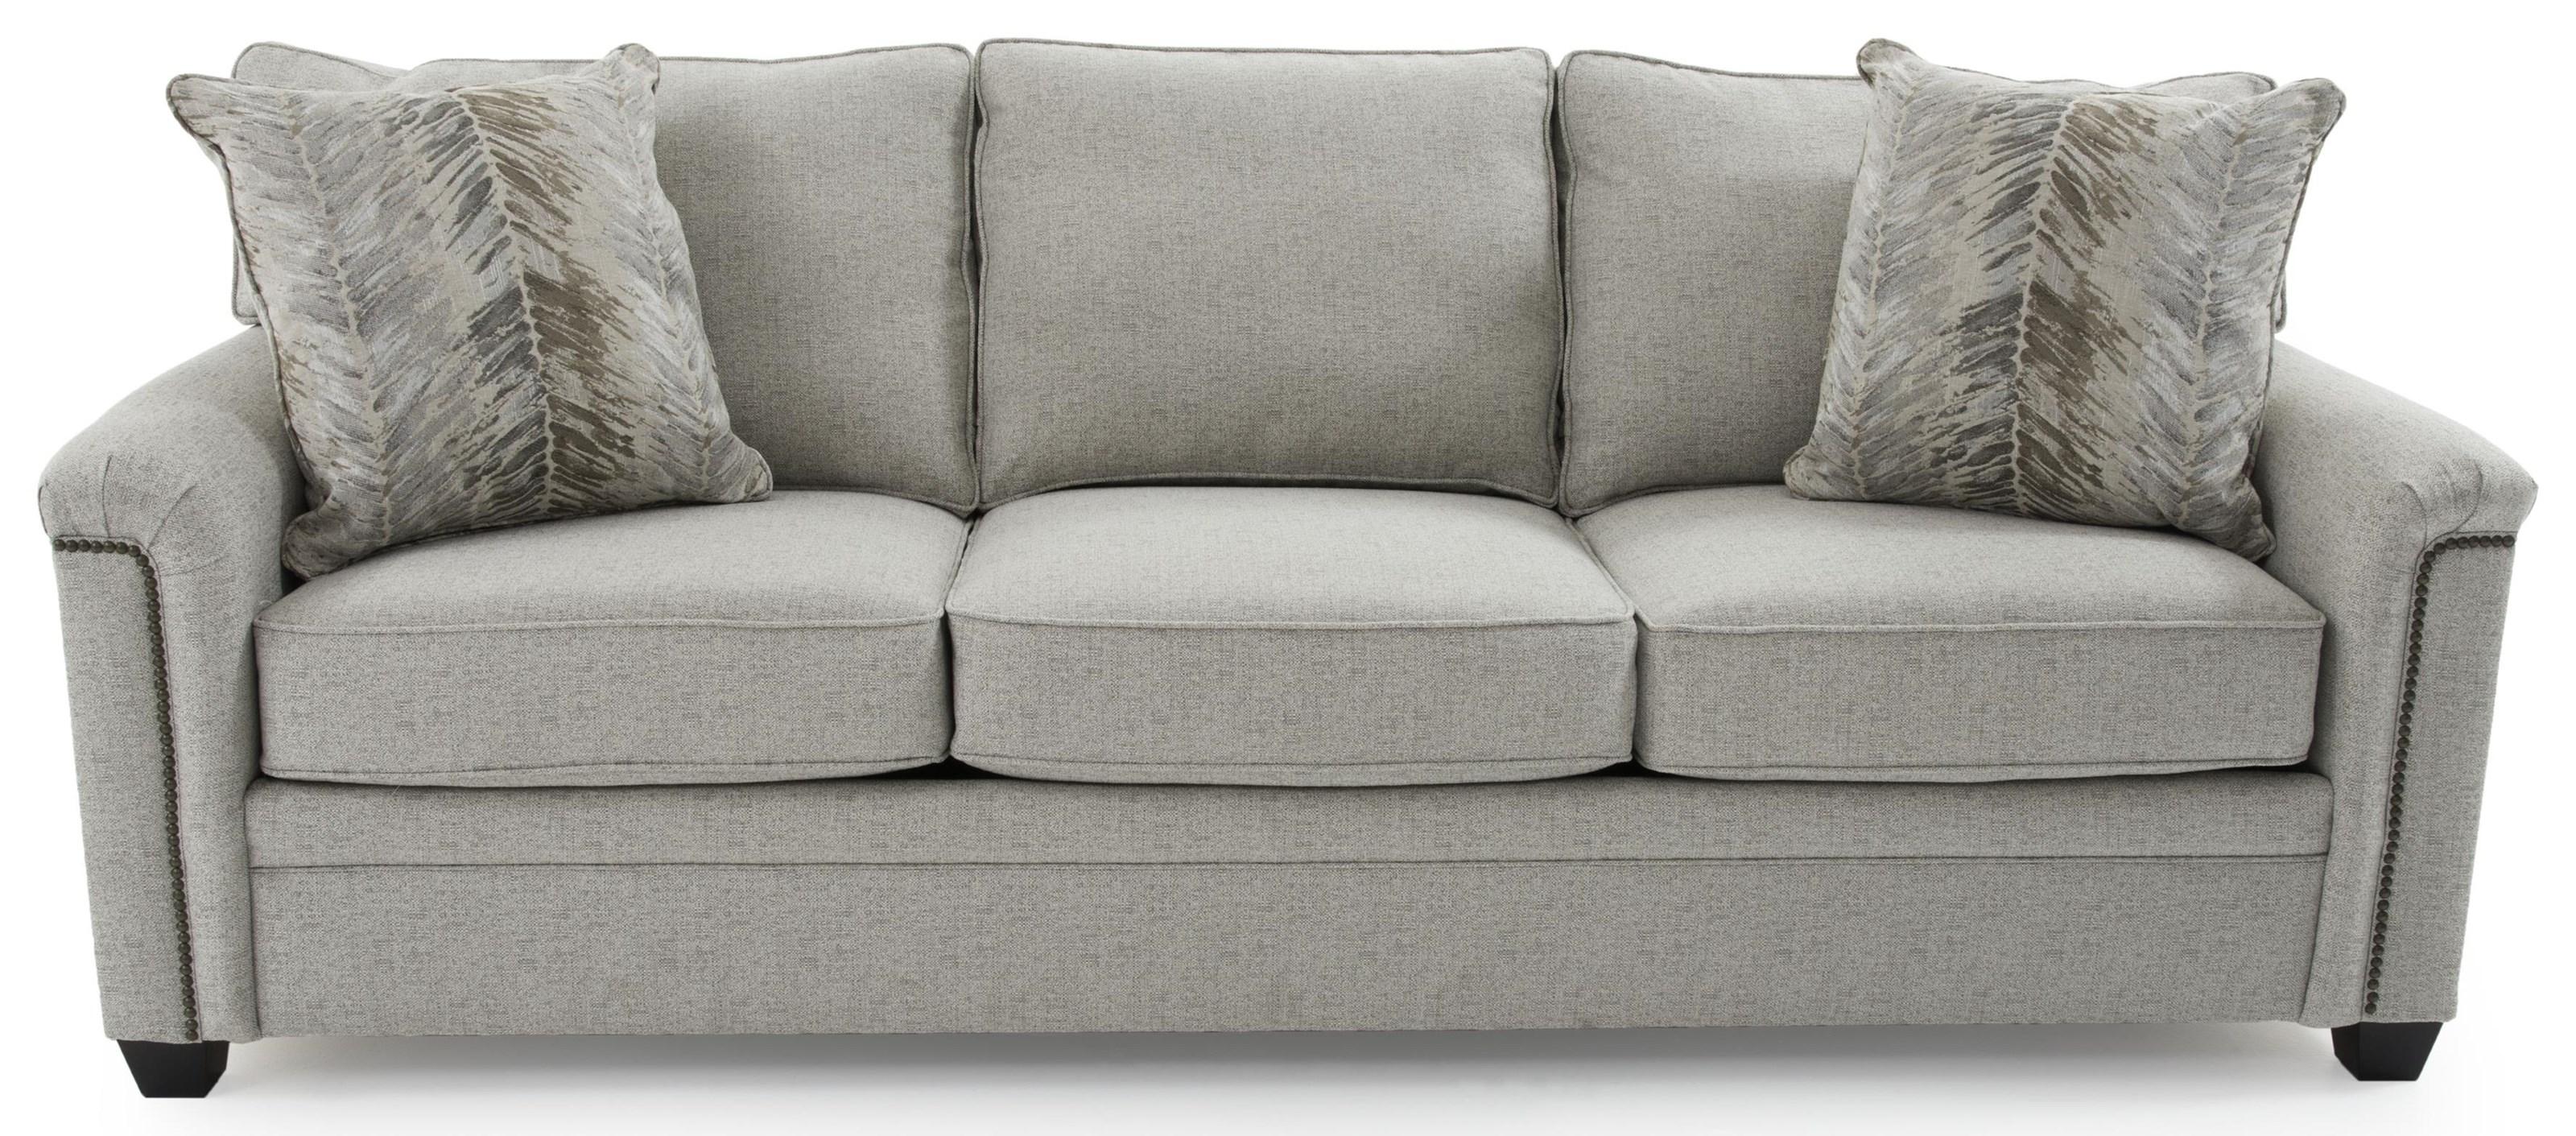 Warren Queen Sleeper Sofa by Stone & Leigh Furniture at Baer's Furniture